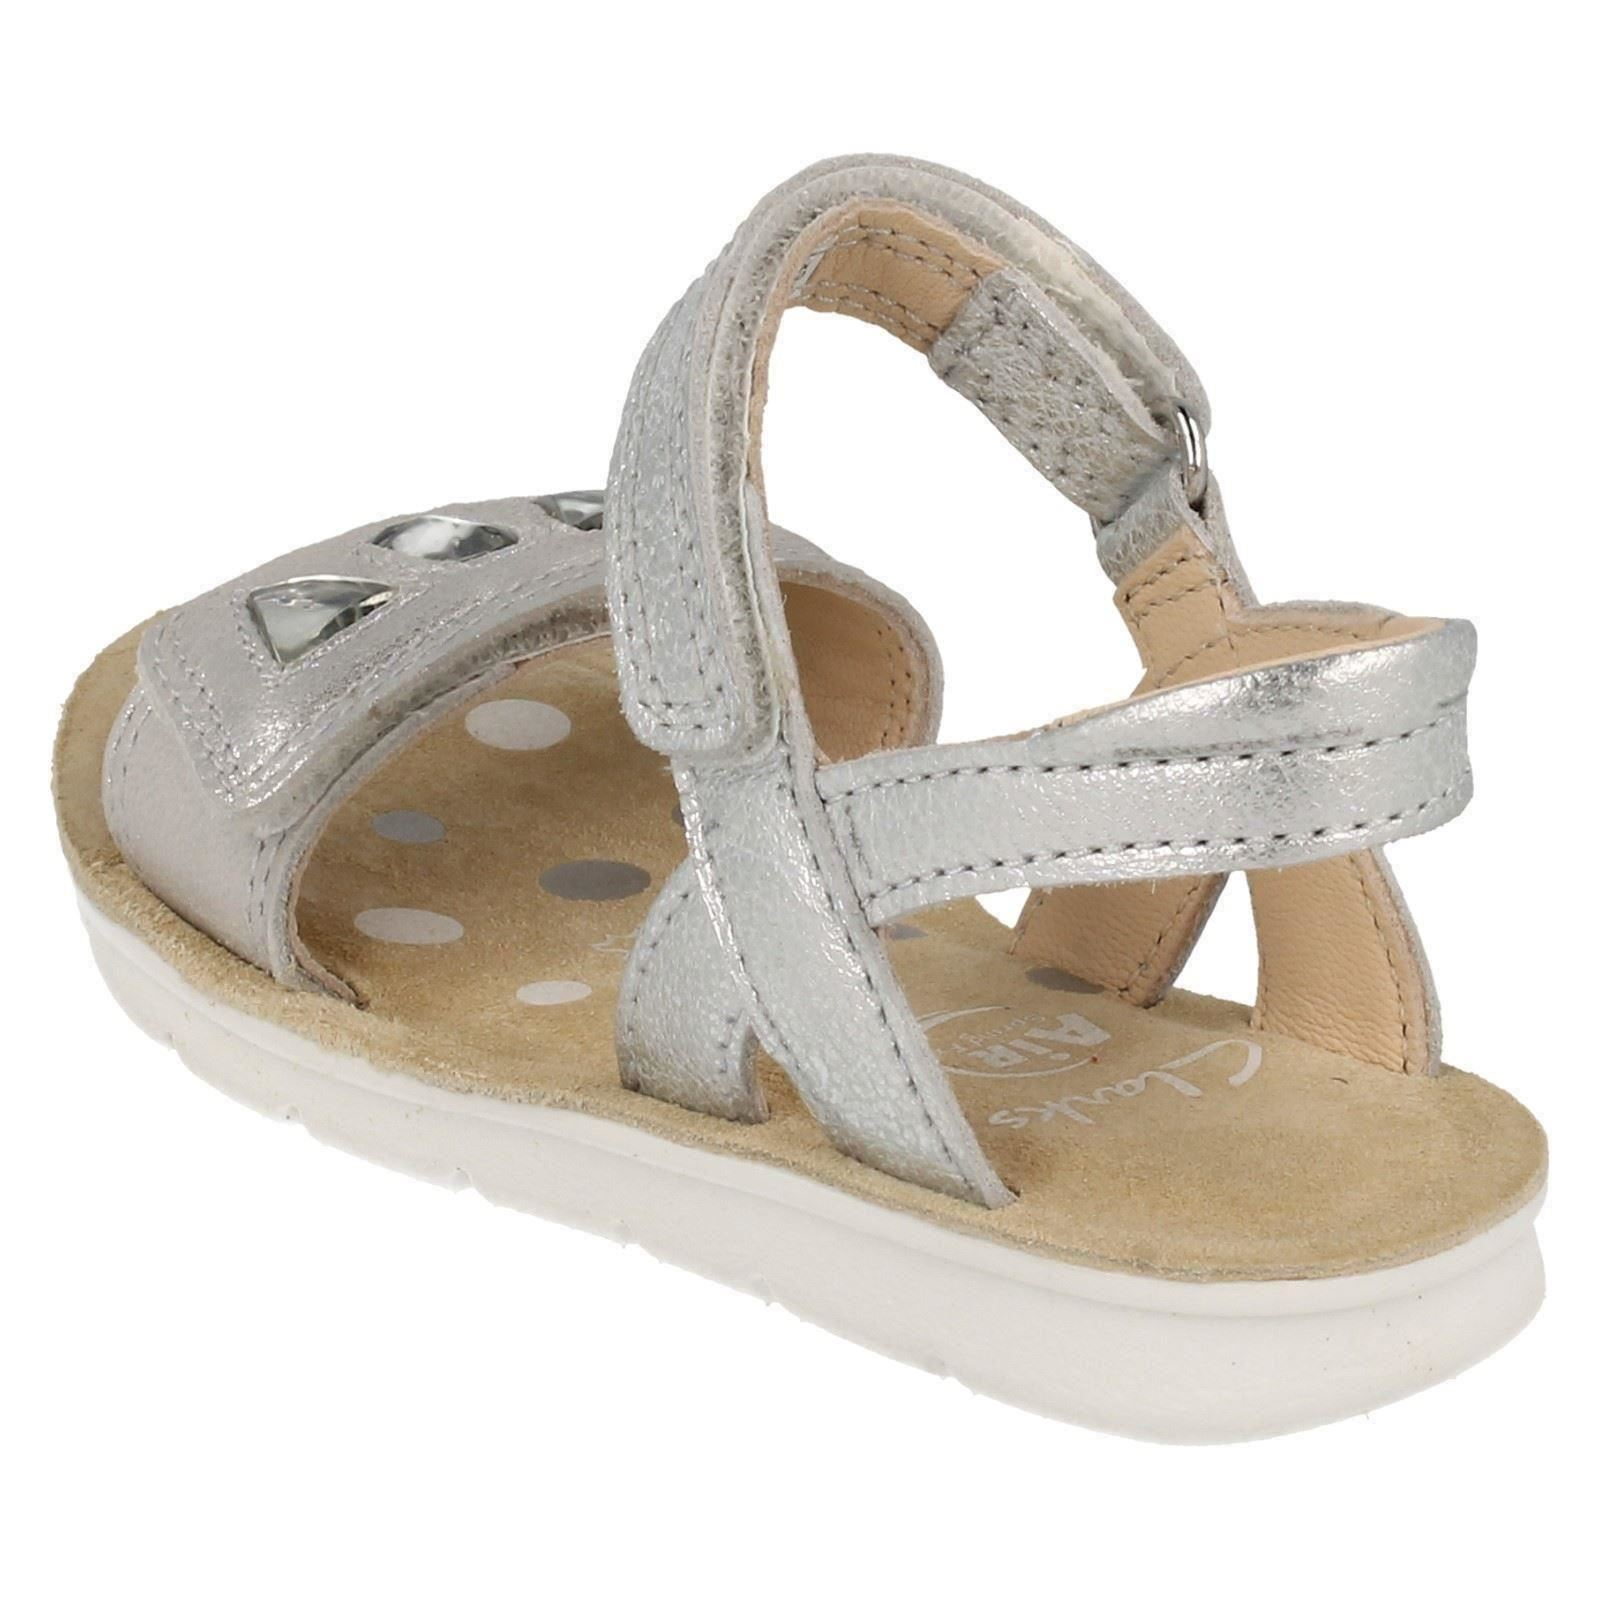 Girls Clarks Casual Summer Sandals Mimomagic Ebay